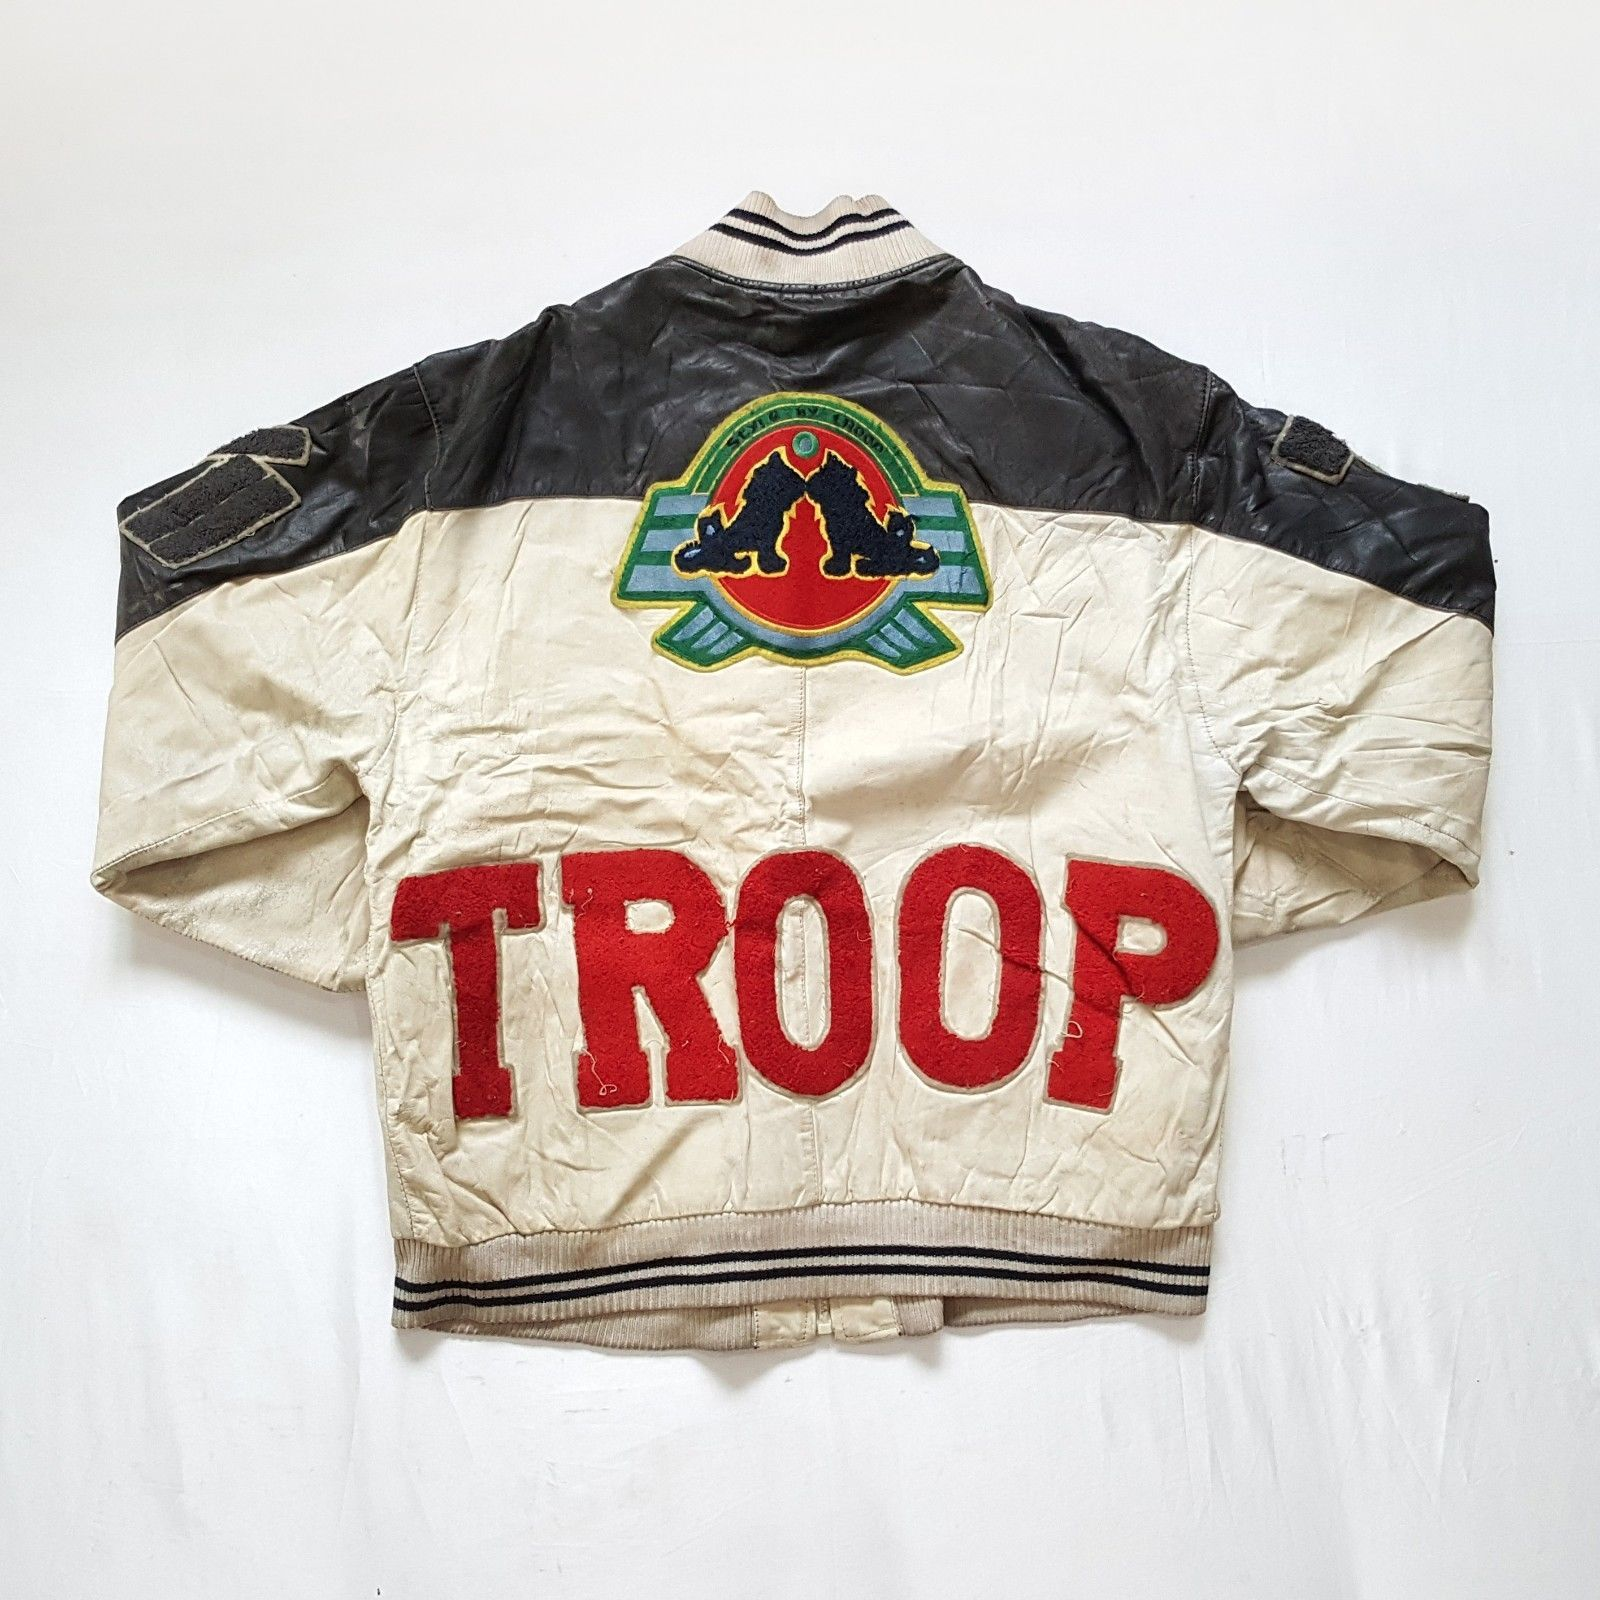 Vintage 90s World Of Troop Leather Bomber Jacket On Vtg90s Ebay Store Http Www Ebay Com Itm Vintage 9 Leather Bomber Jacket Leather Bomber Mens 90s Fashion [ 1600 x 1600 Pixel ]